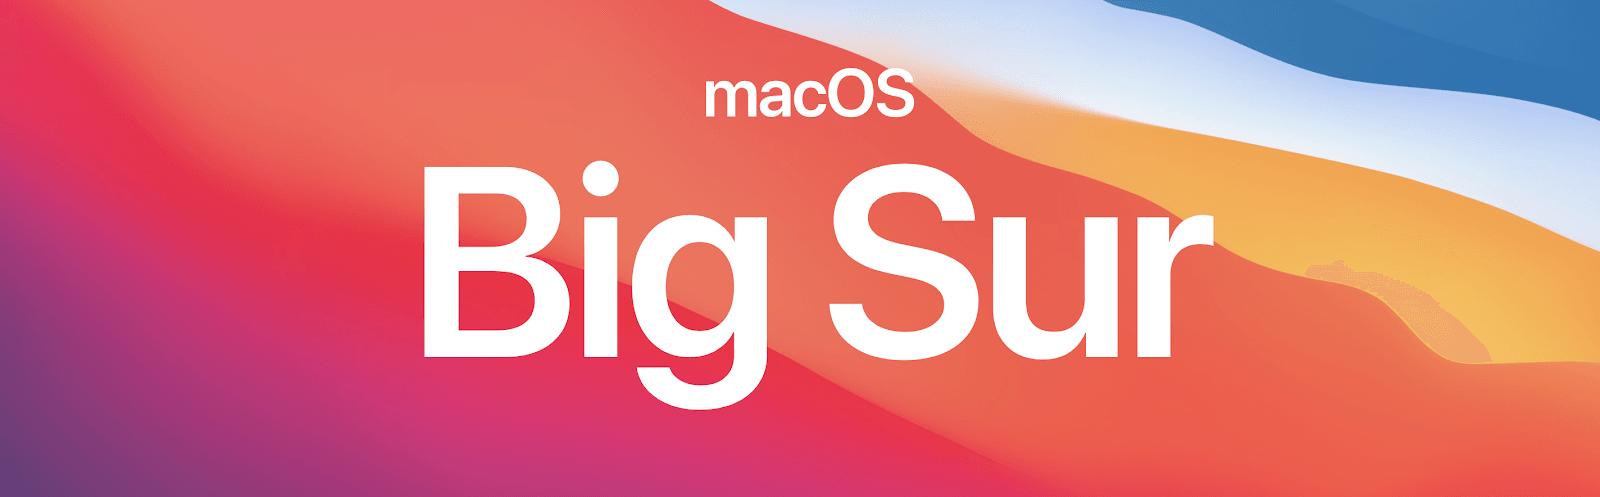 macOS BigSur